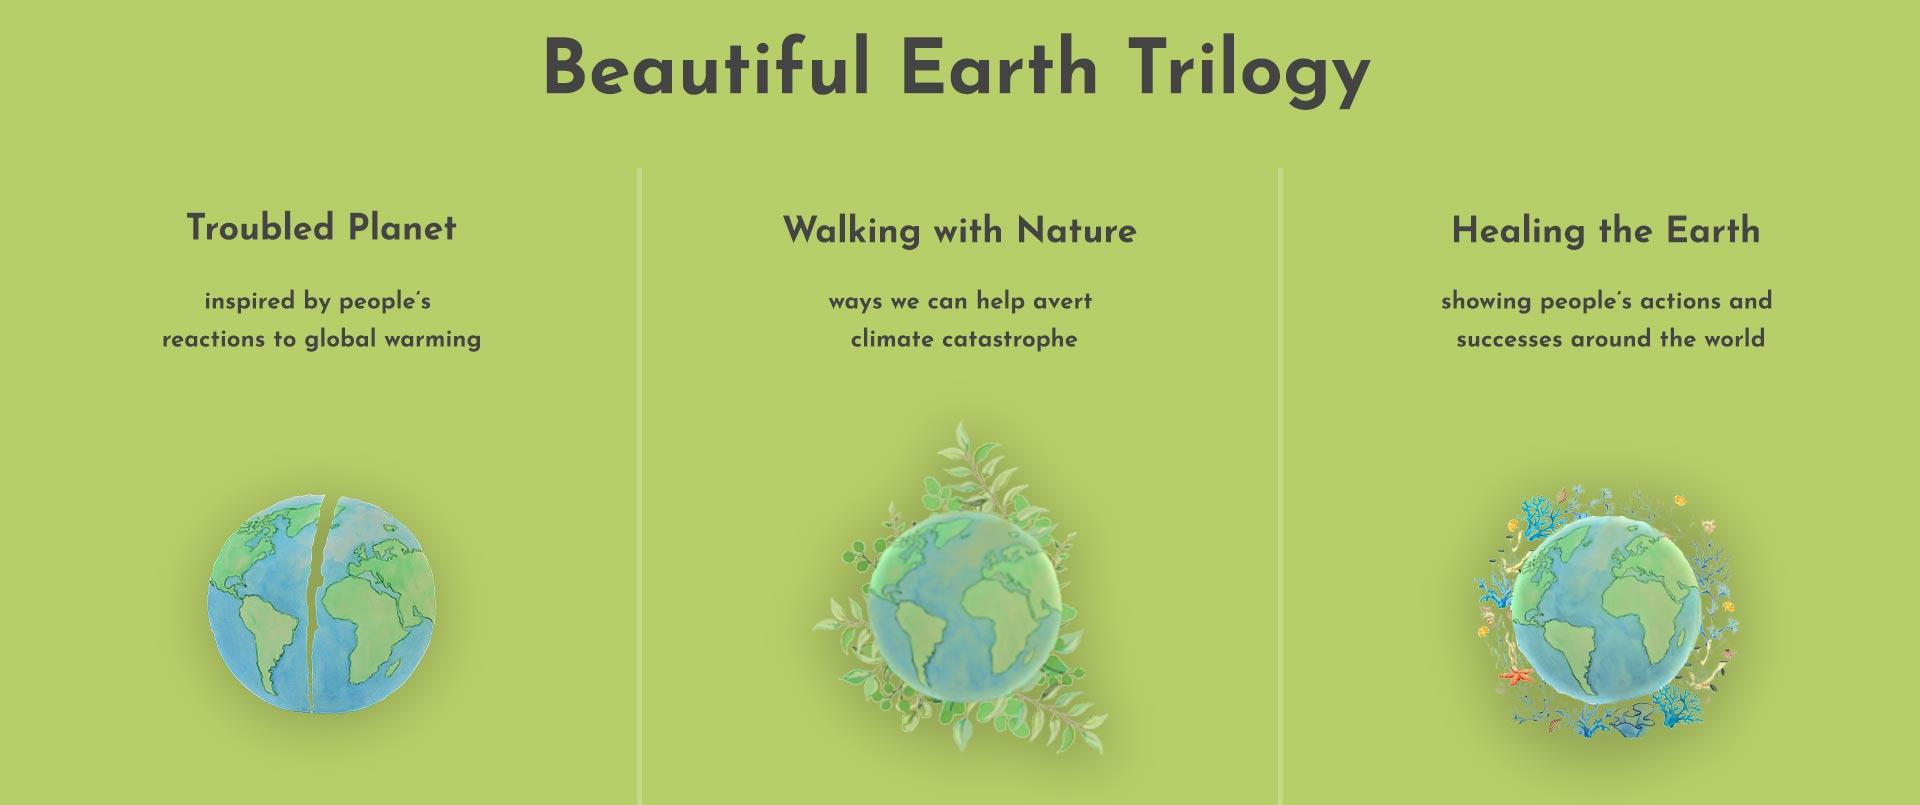 Beautiful Earth Trilogy